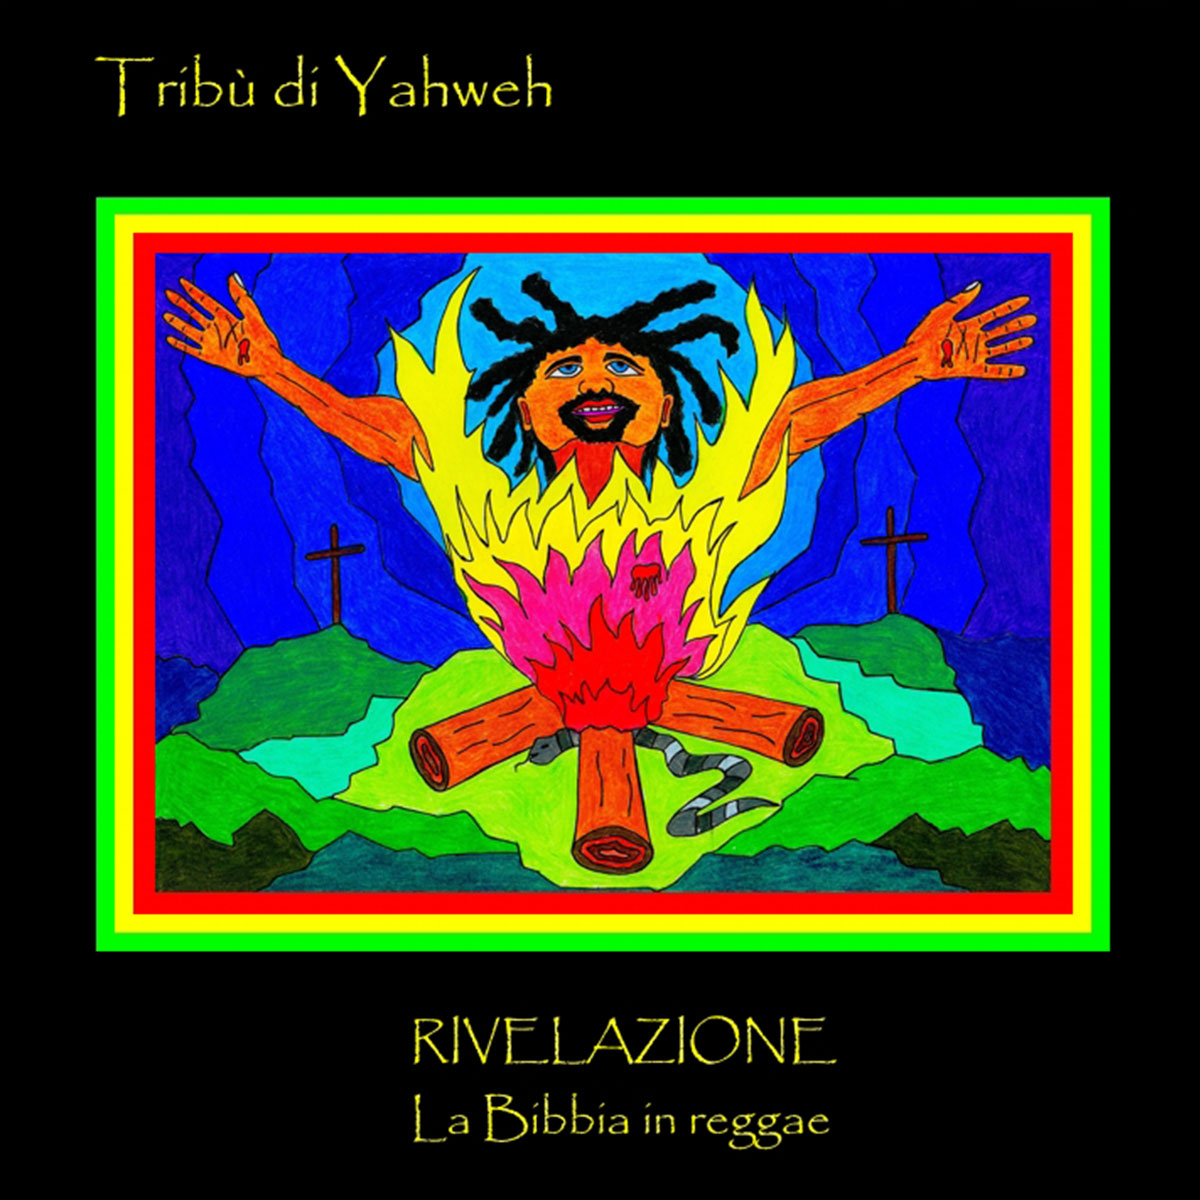 https://www.tribudiyahweh.com/wp/wp-content/uploads/2019/02/RIVELAZIONE-la-Bibbia-in-reggae.jpg